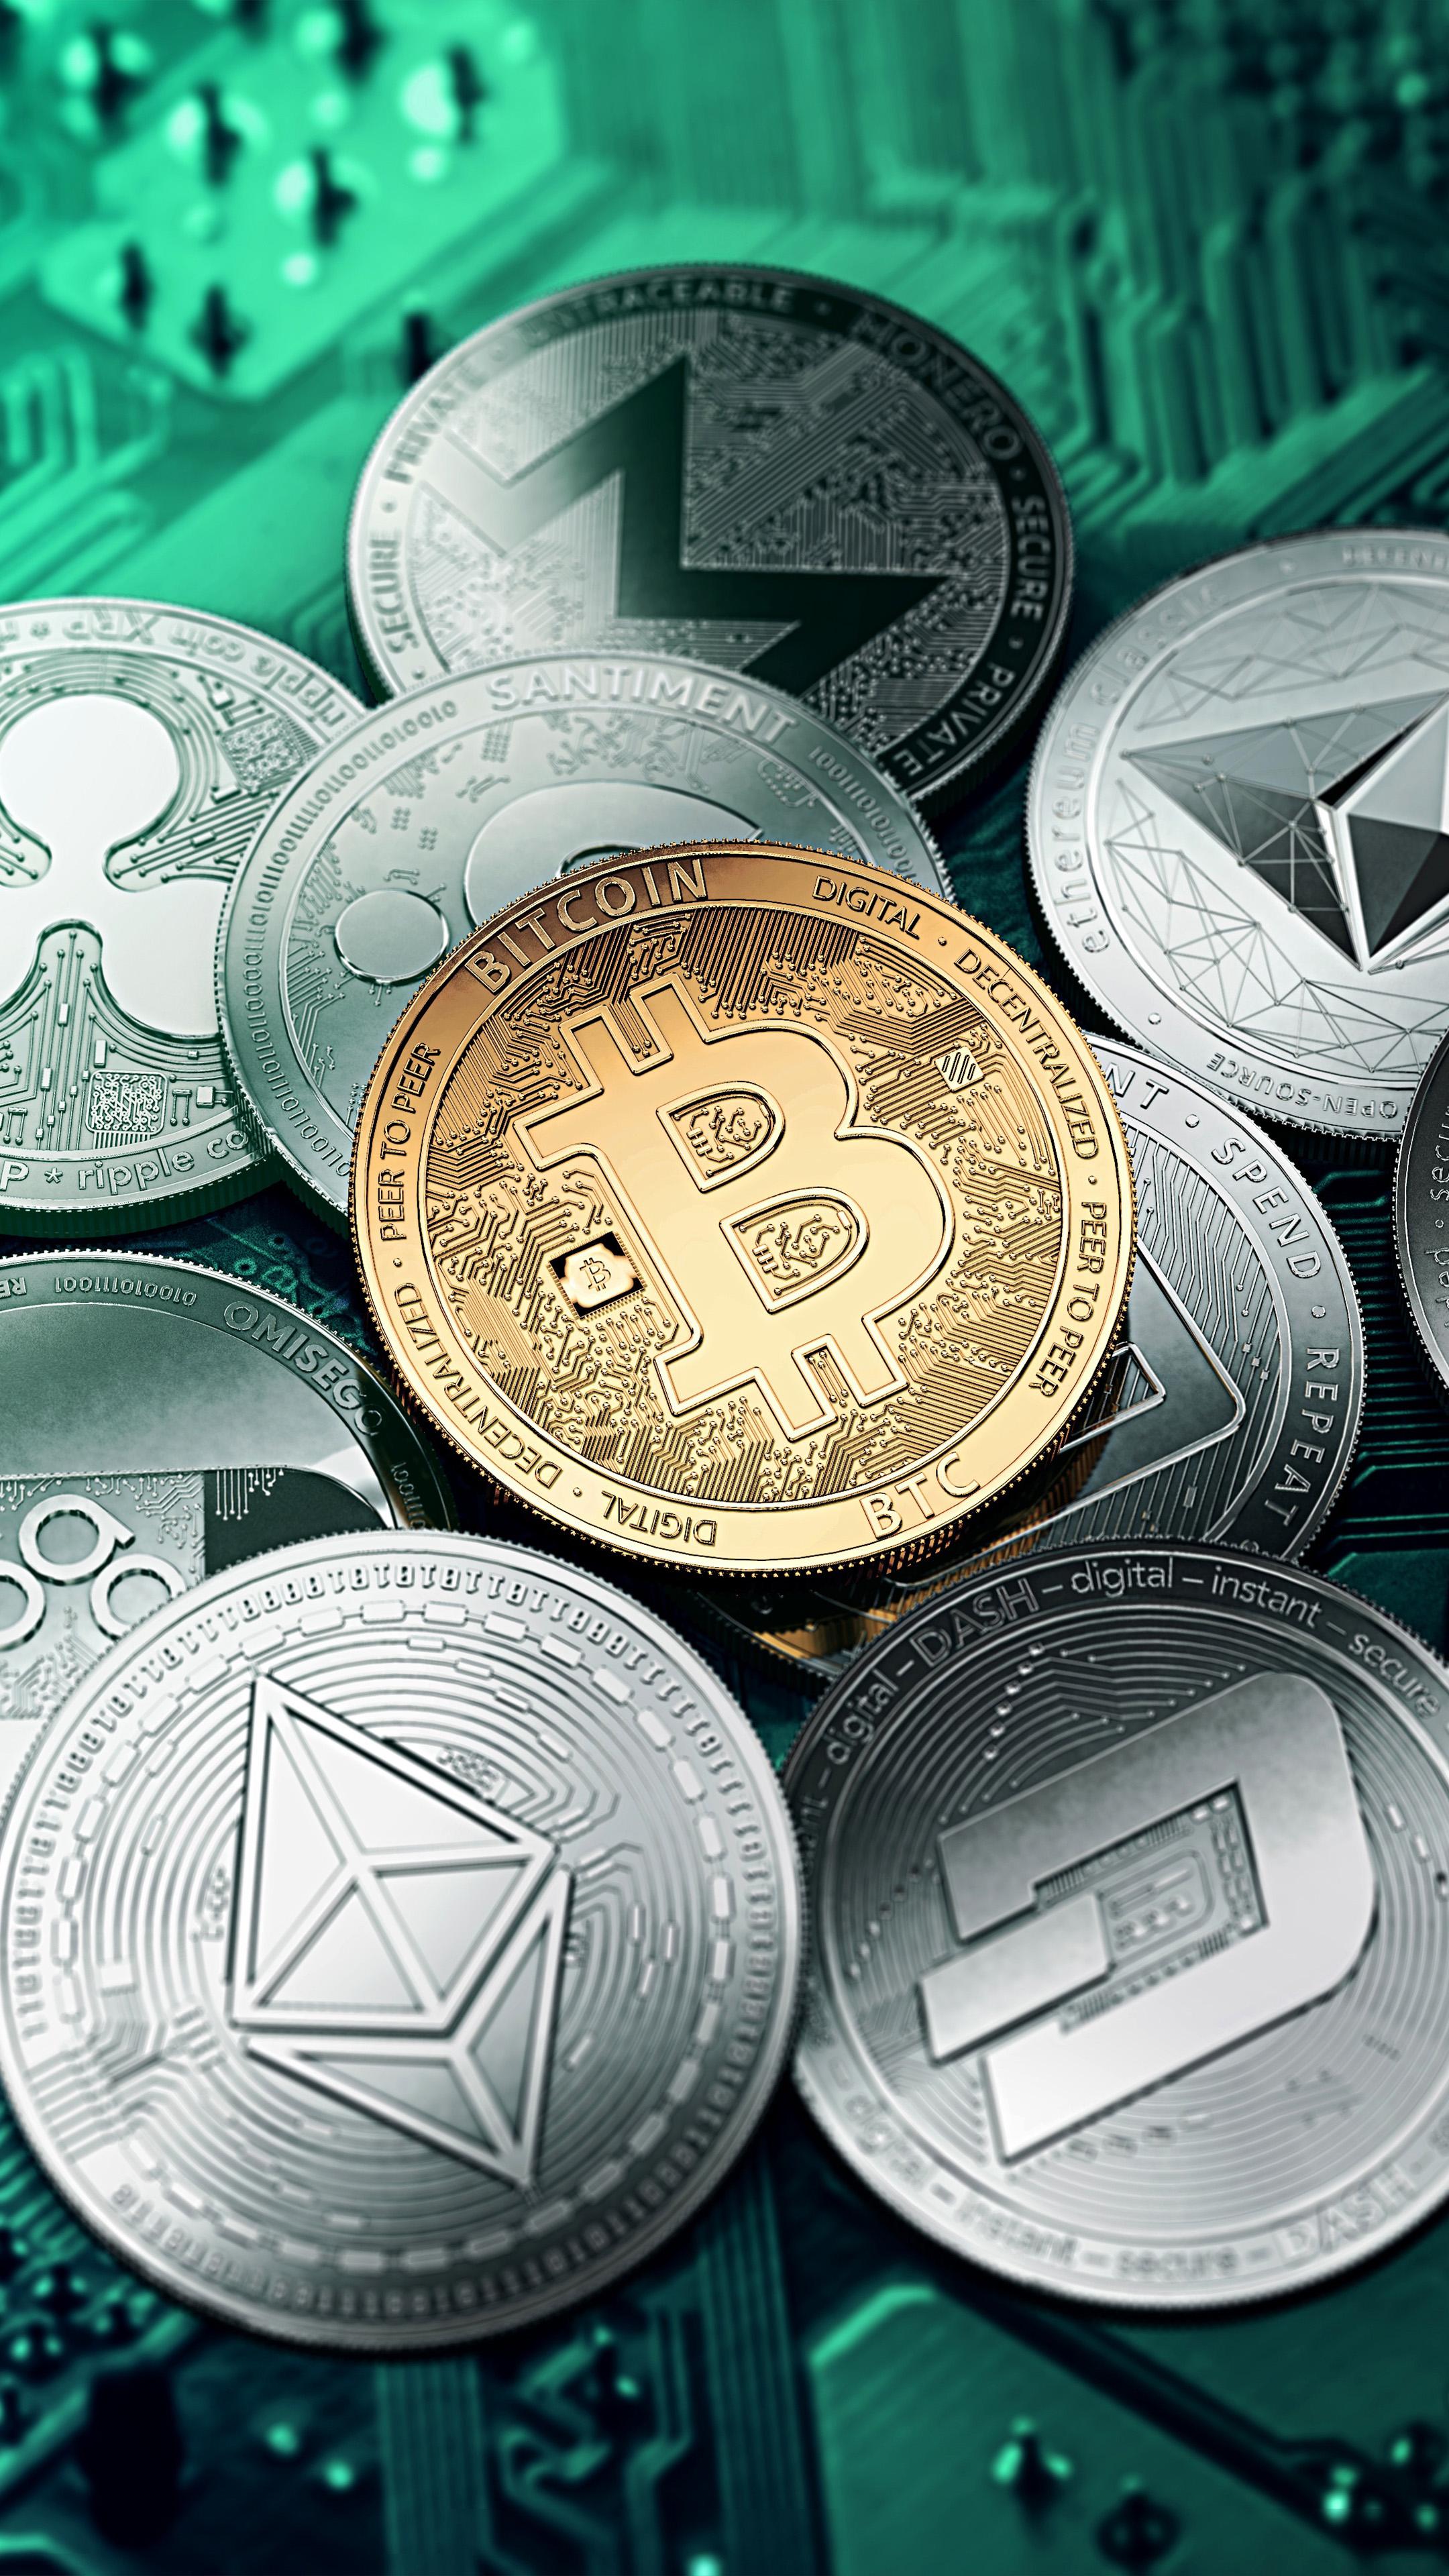 Bitcoin Digital Currencies Technology 4k Ultra Hd Mobile Wallpaper